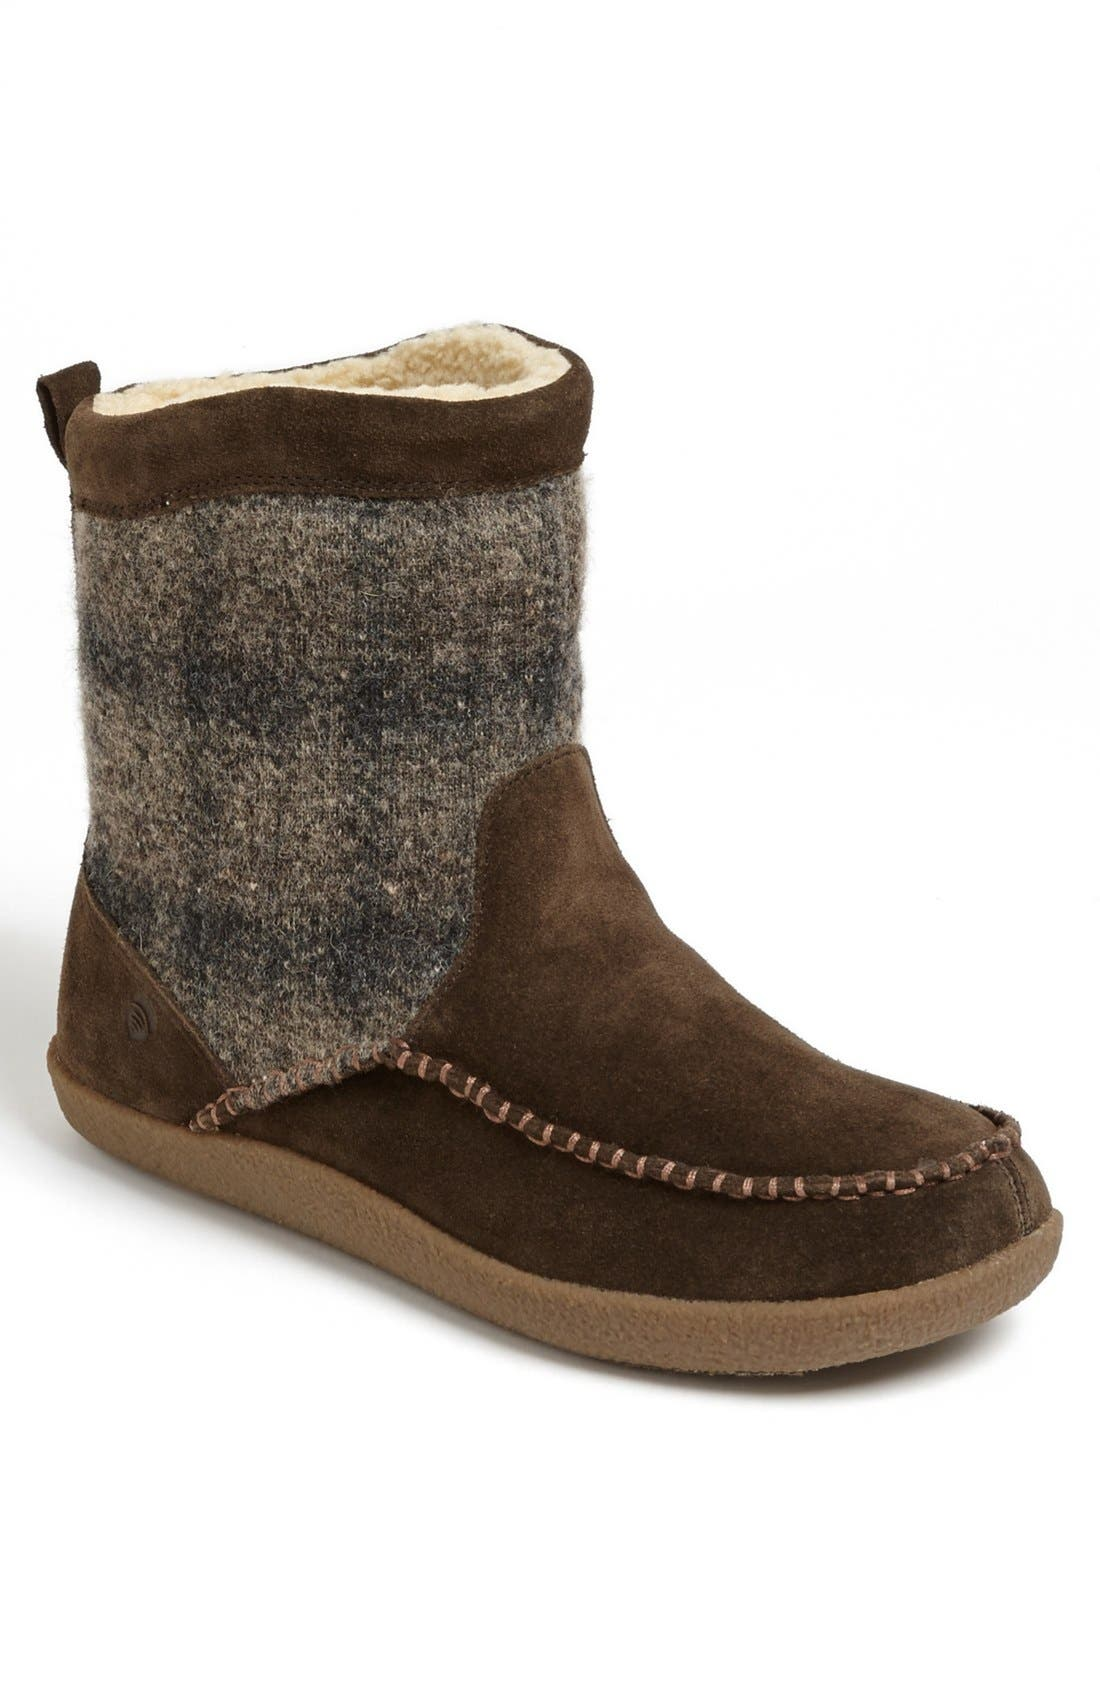 Alternate Image 1 Selected - Acorn 'Crosslander' Boot (Men)